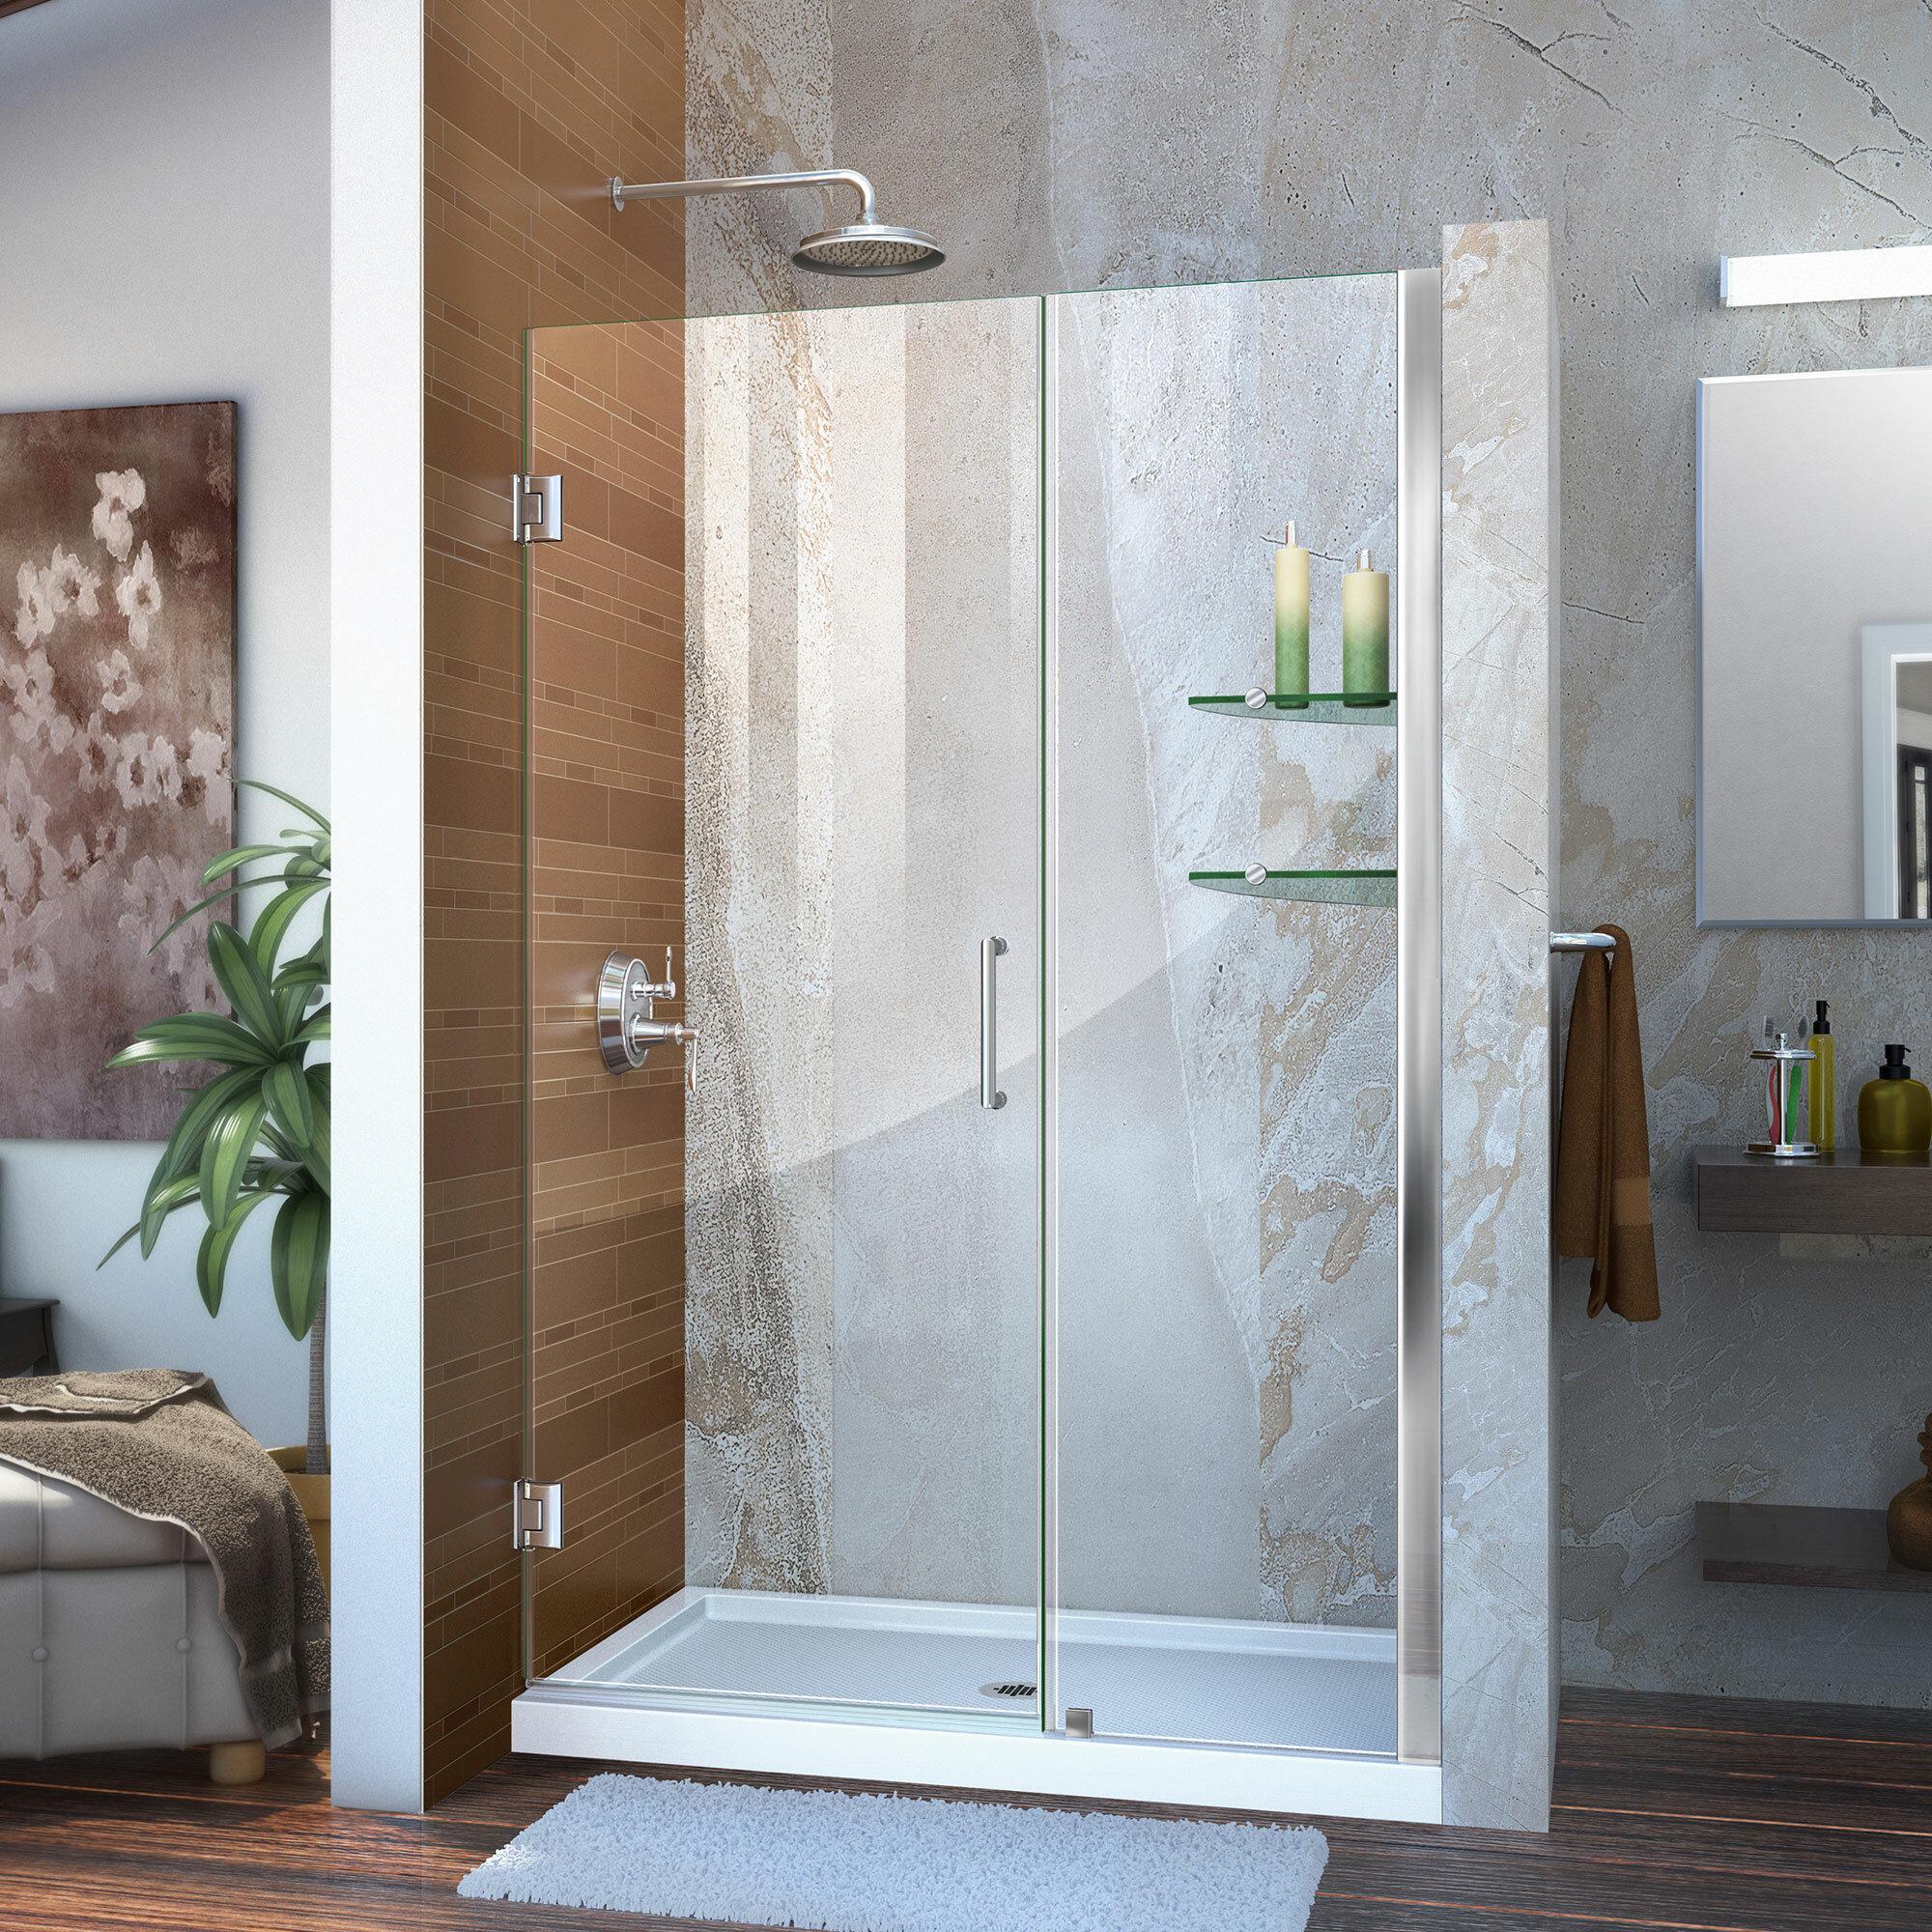 Unidoor 46 X 72 Hinged Frameless Shower Door With Clearmax Technology